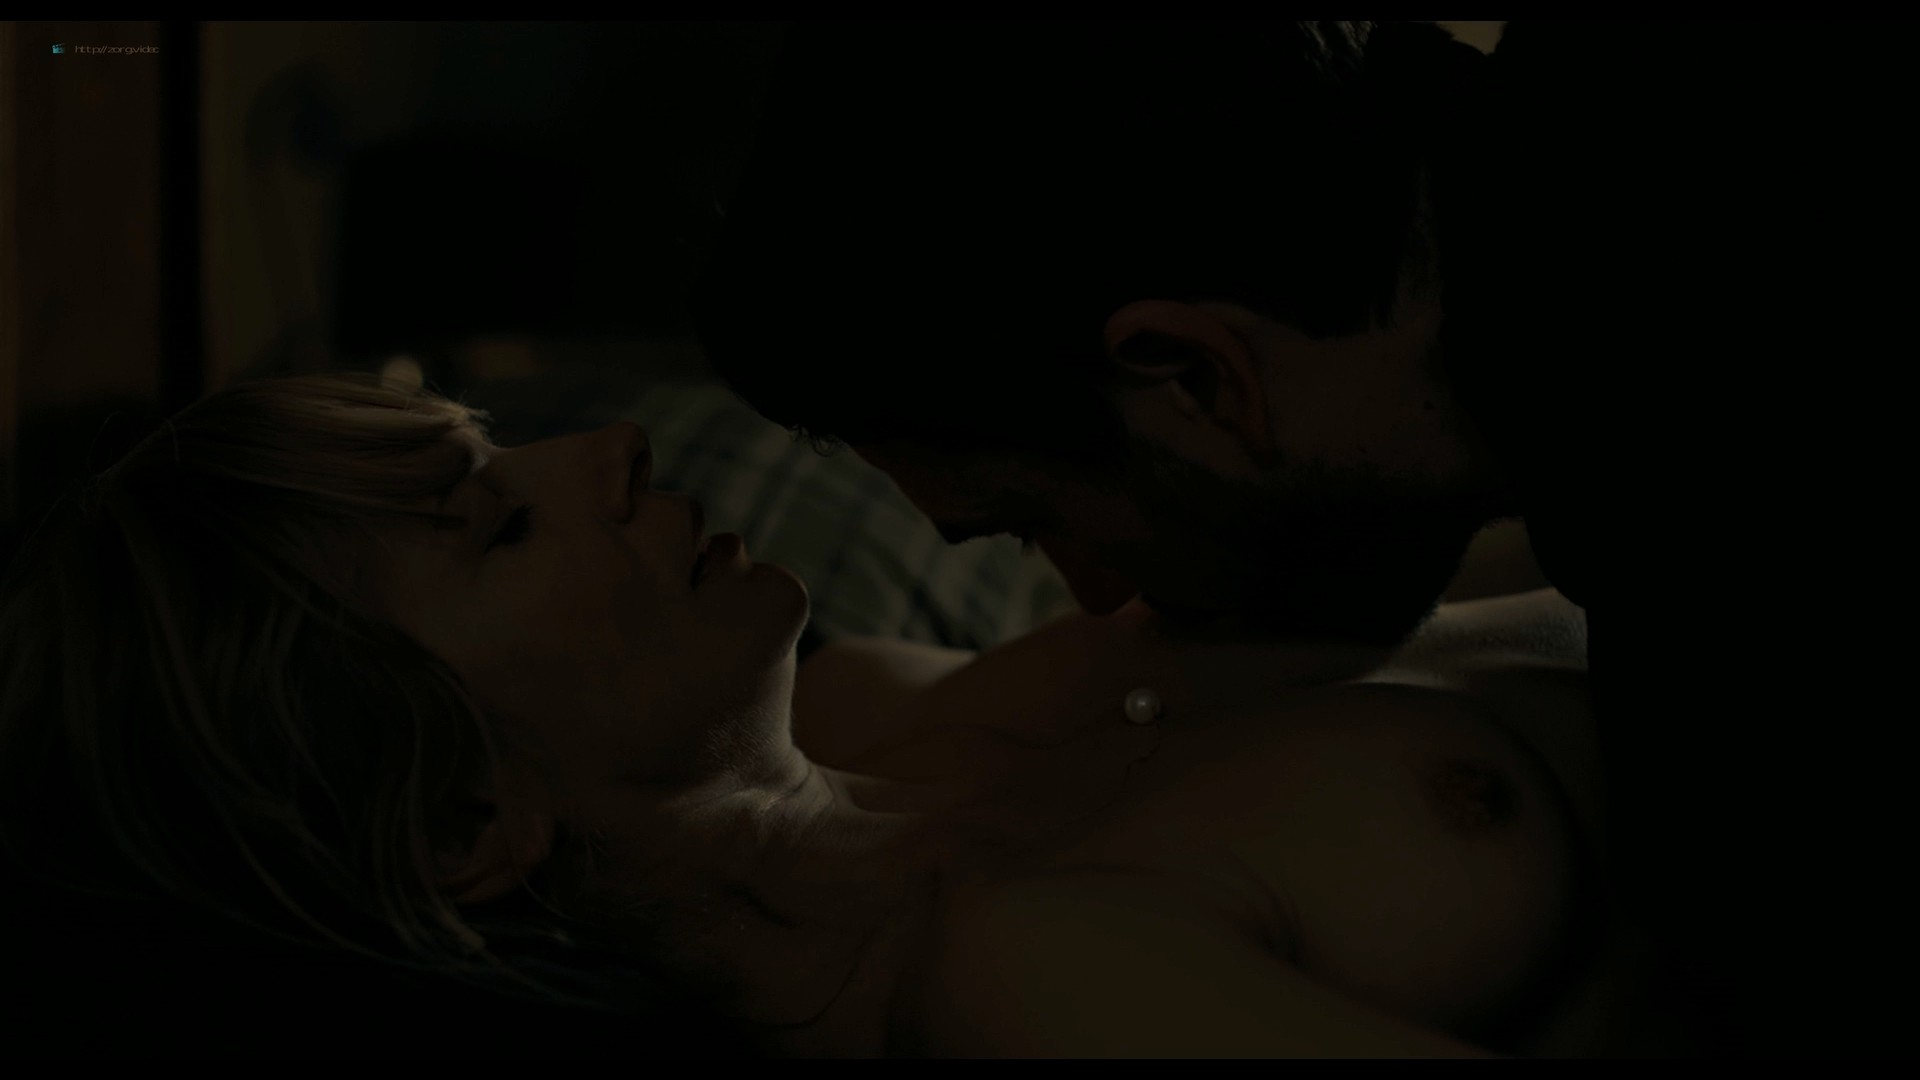 Magdalena Cielecka nude sex Roma Gasiorowska nude too - Dark, Almost Night (PL-2019) HD 1080p BluRay (6)